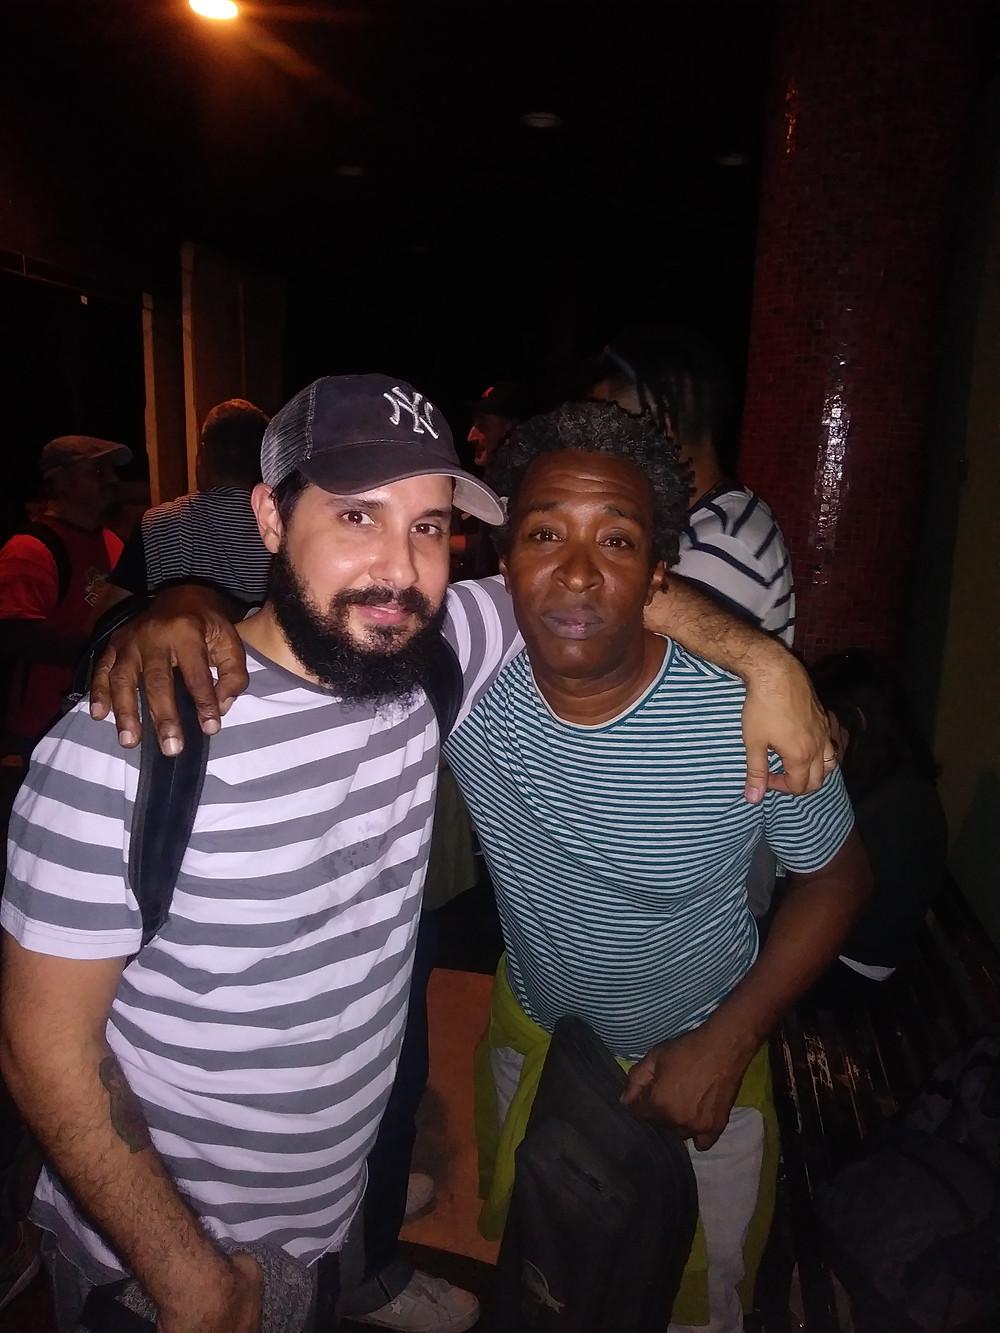 TWO OF CUBA'S BEST JAZZ MUSICIANS OLIVER VALDES+JUAN CARLOS MARIN